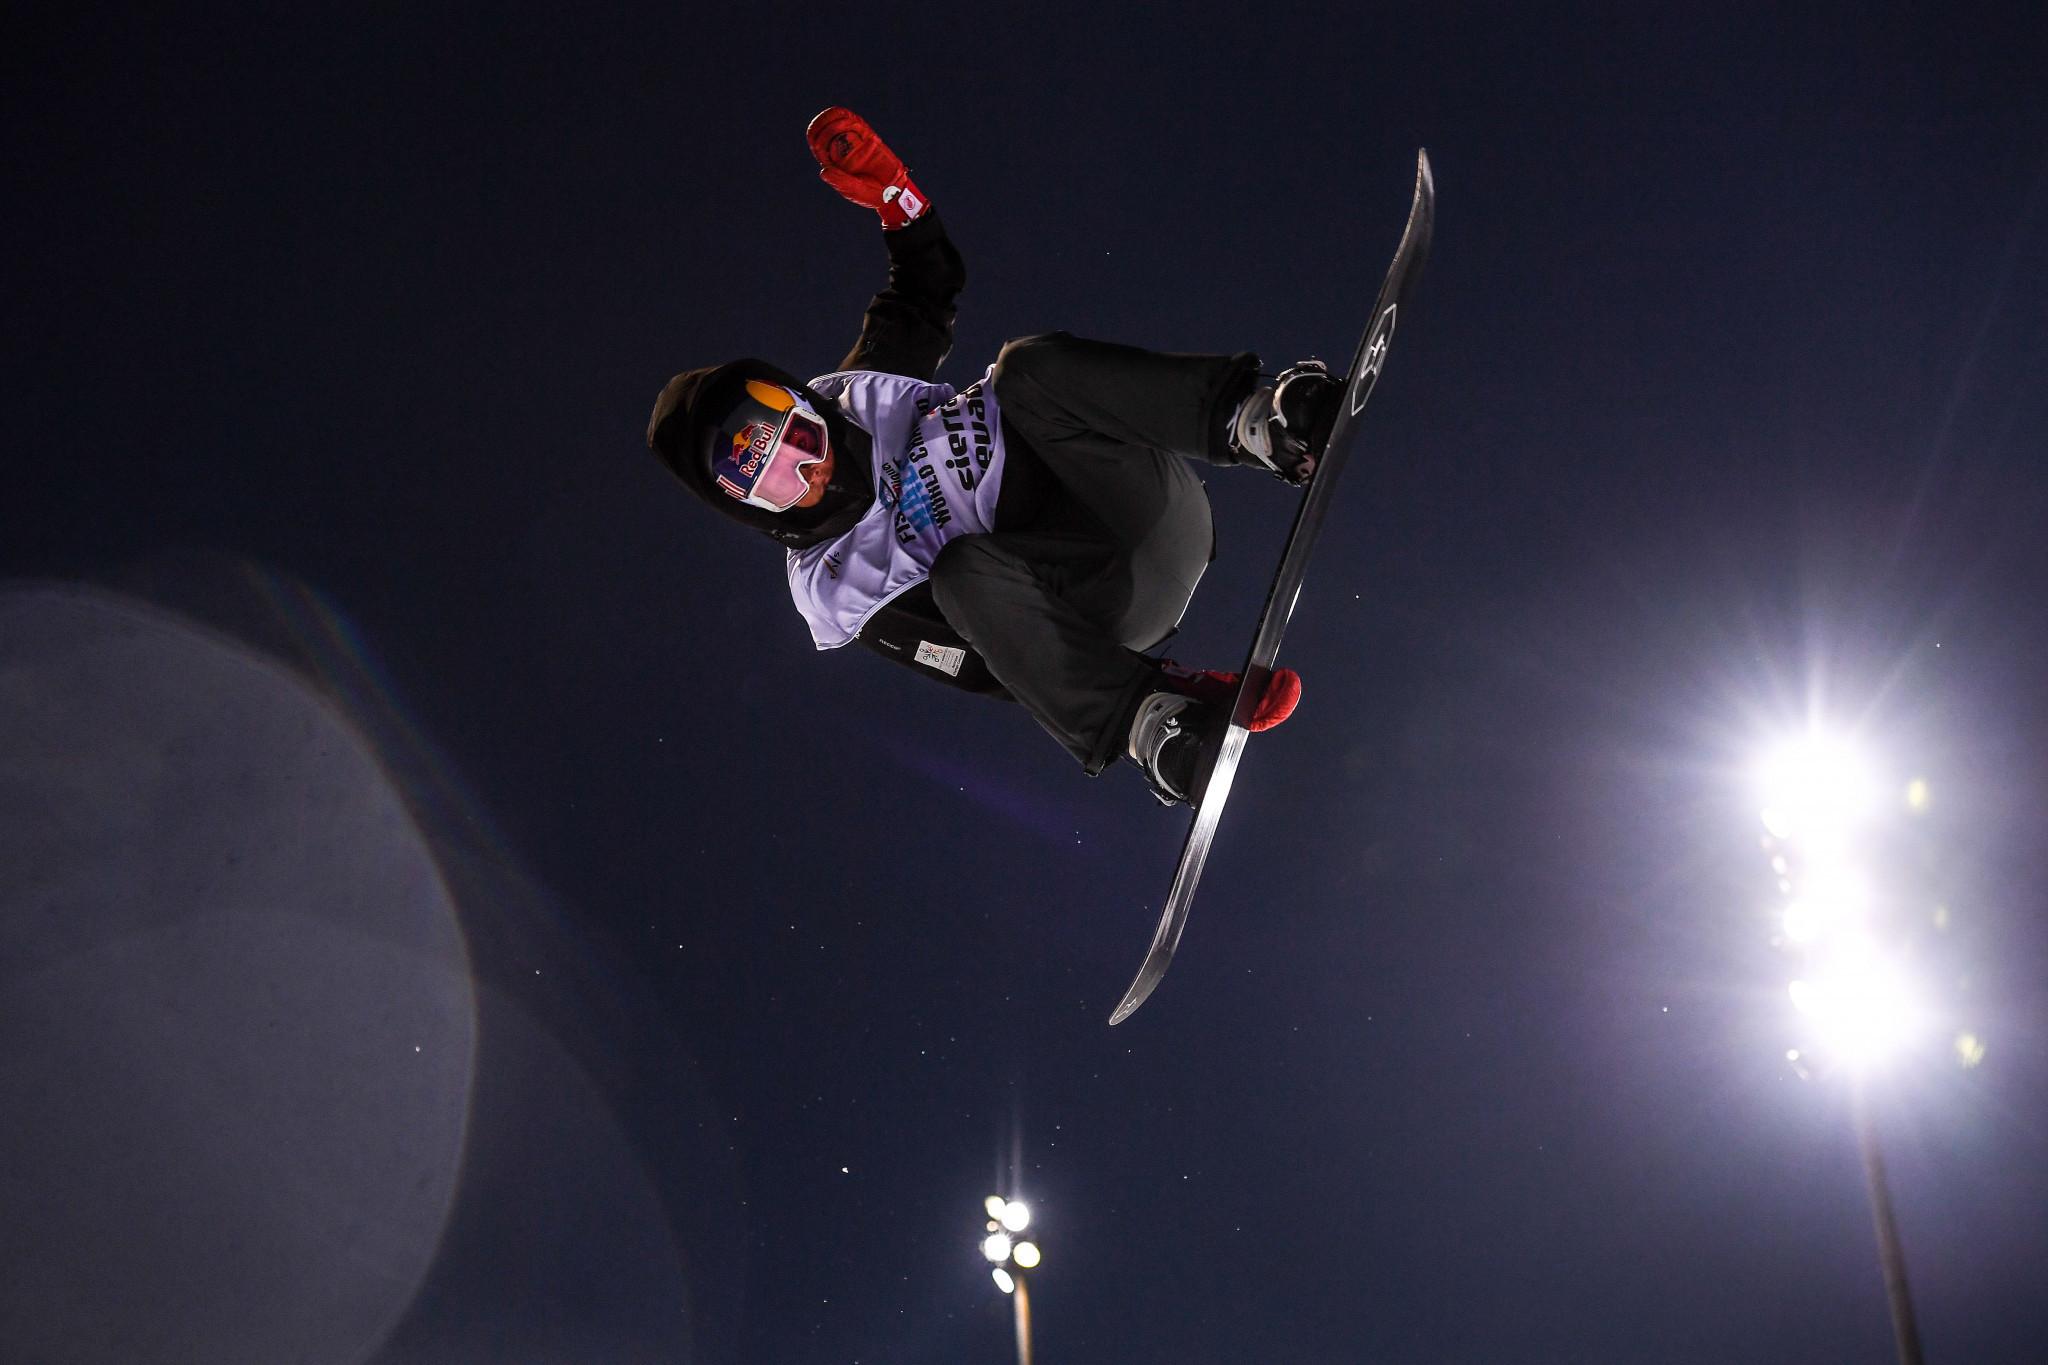 Australian James promises new tricks in bid for Pyeongchang 2018 glory